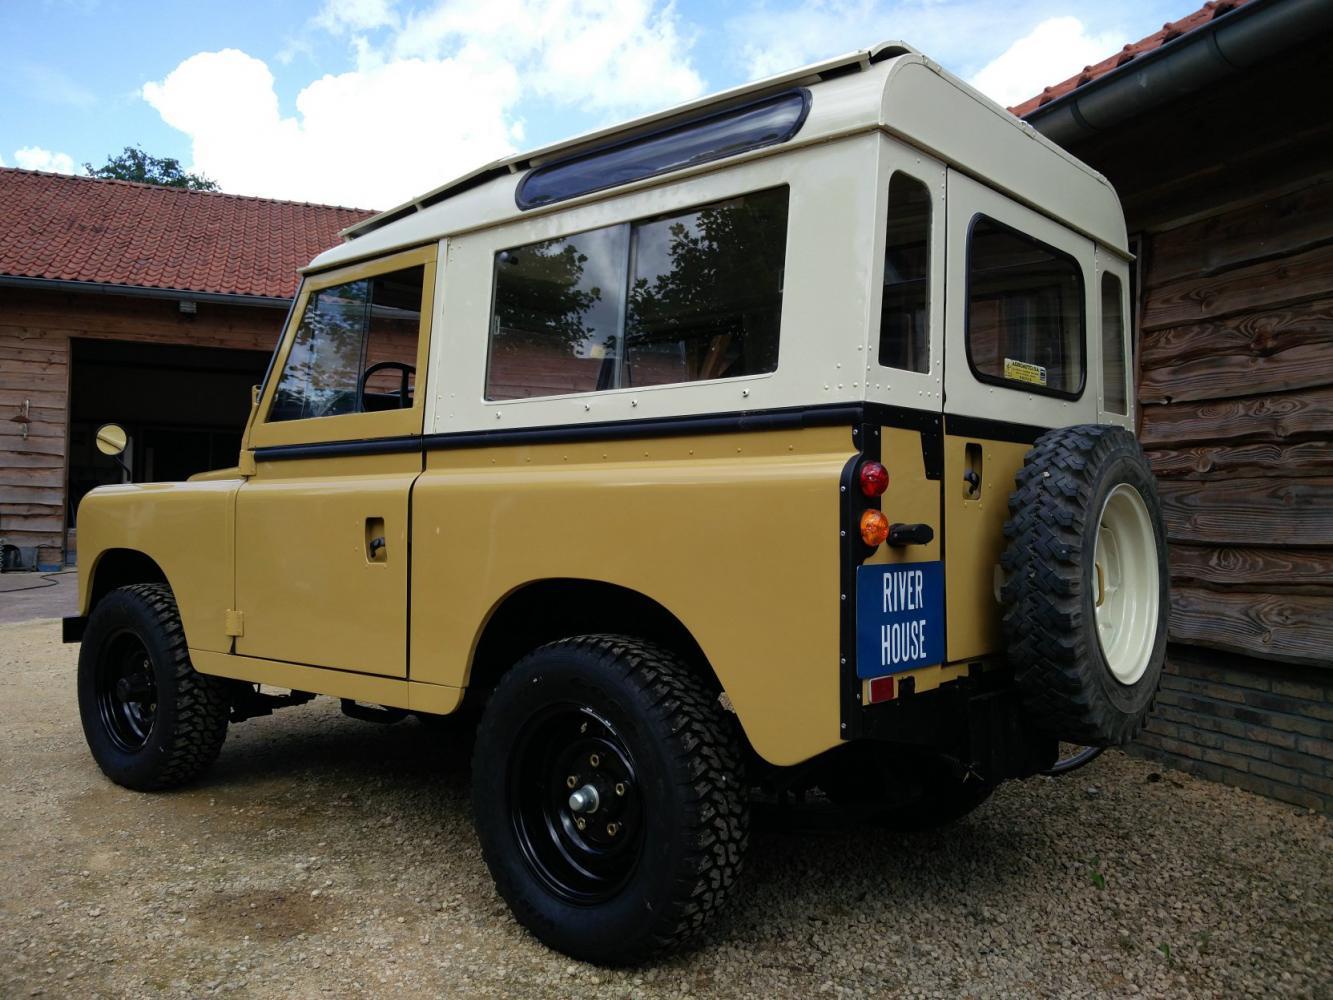 Click image for larger version  Name:1978 LR LHD Santana 88 Hardtop A Mustard Yellow left rear.jpg Views:159 Size:173.2 KB ID:289905